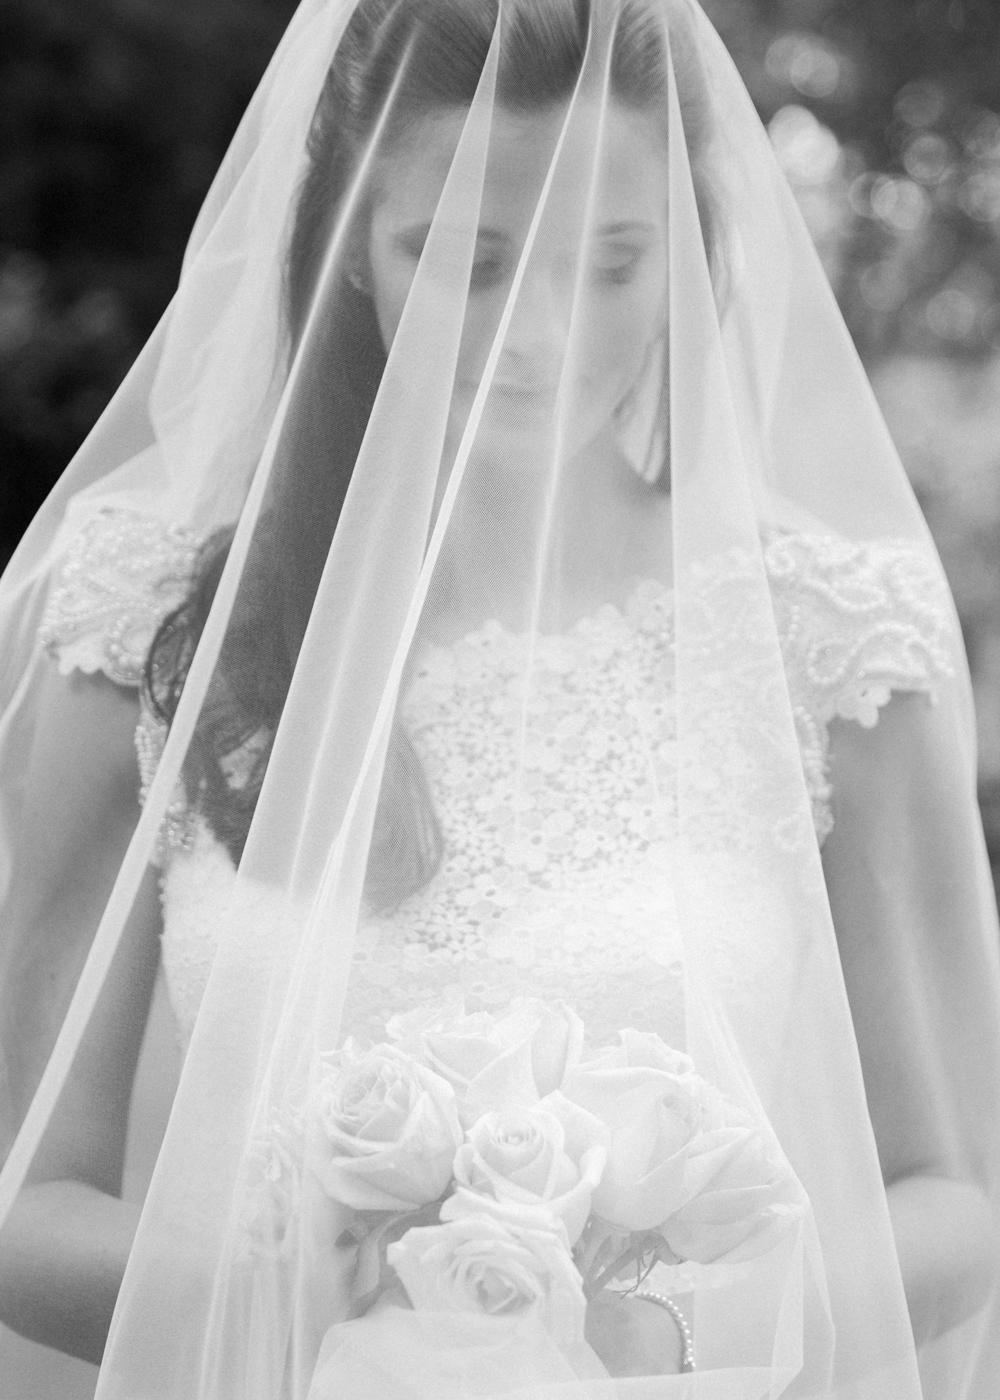 Wedding_photography_by_Tanya_Isaeva-6.jpg